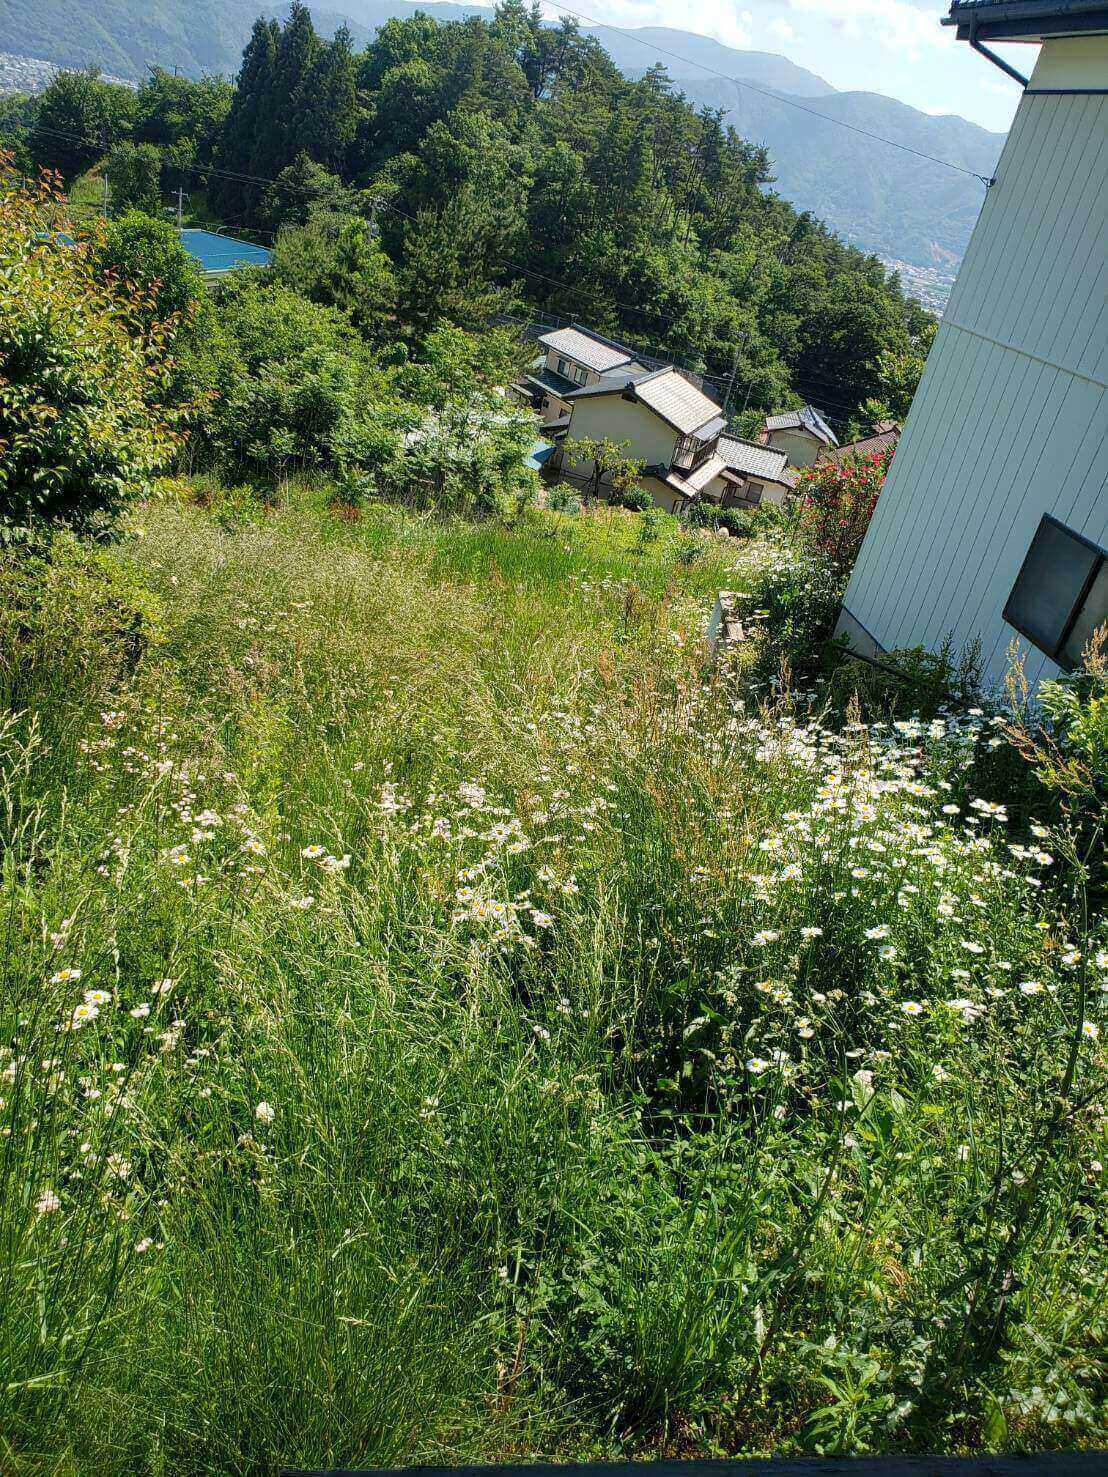 2021年5月31日東信地域草刈り3